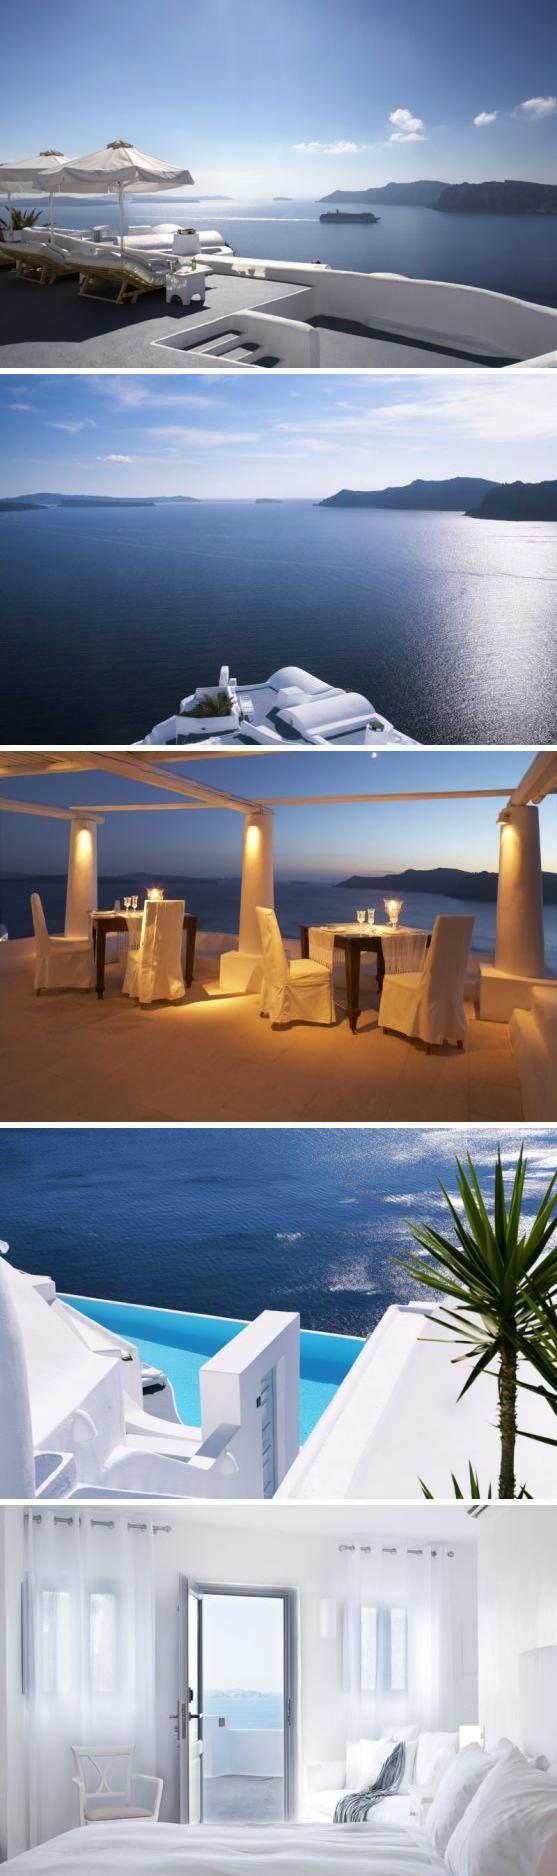 Honeymoon Destinations Luxury Style: Katikies Hotel, Greece